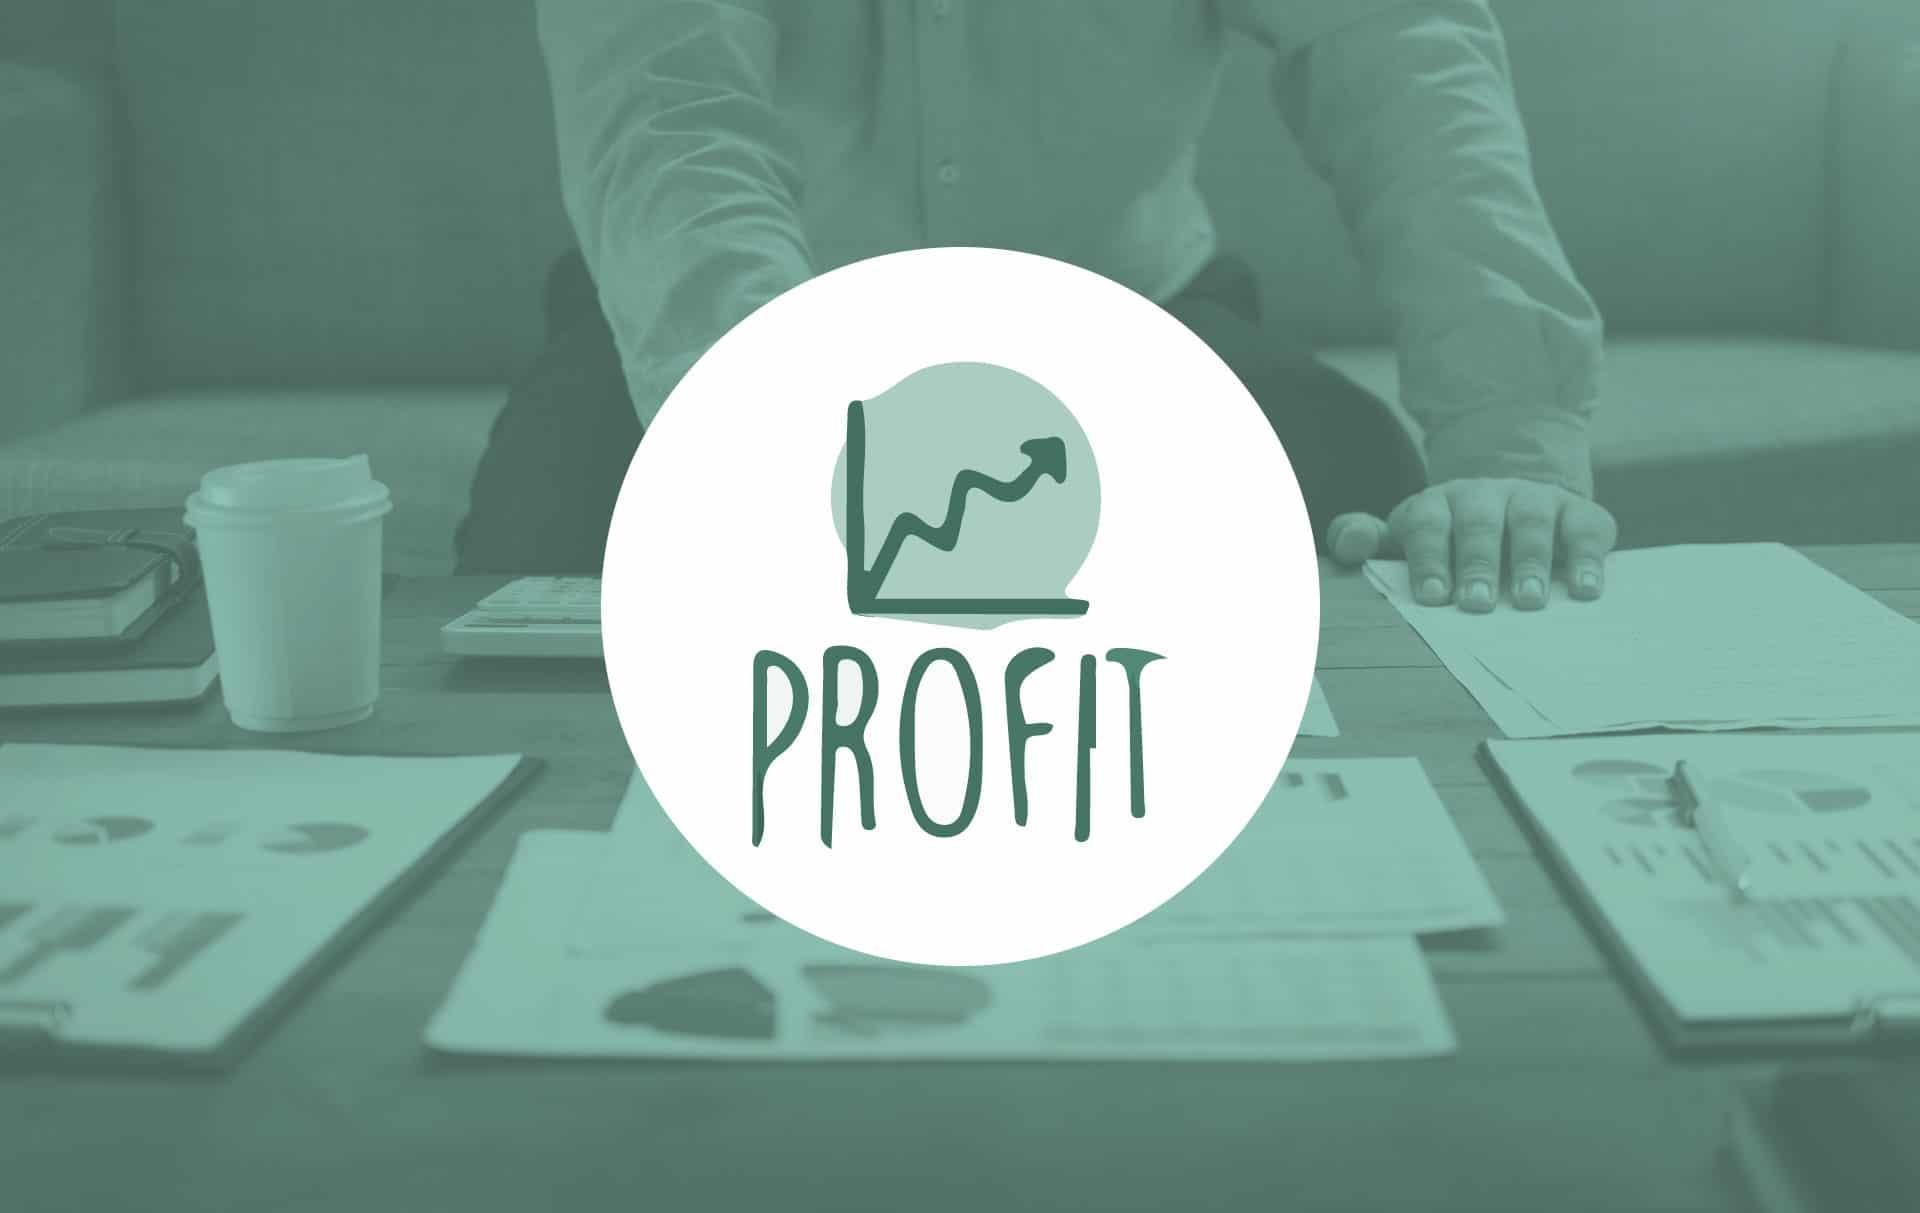 mvo-profit